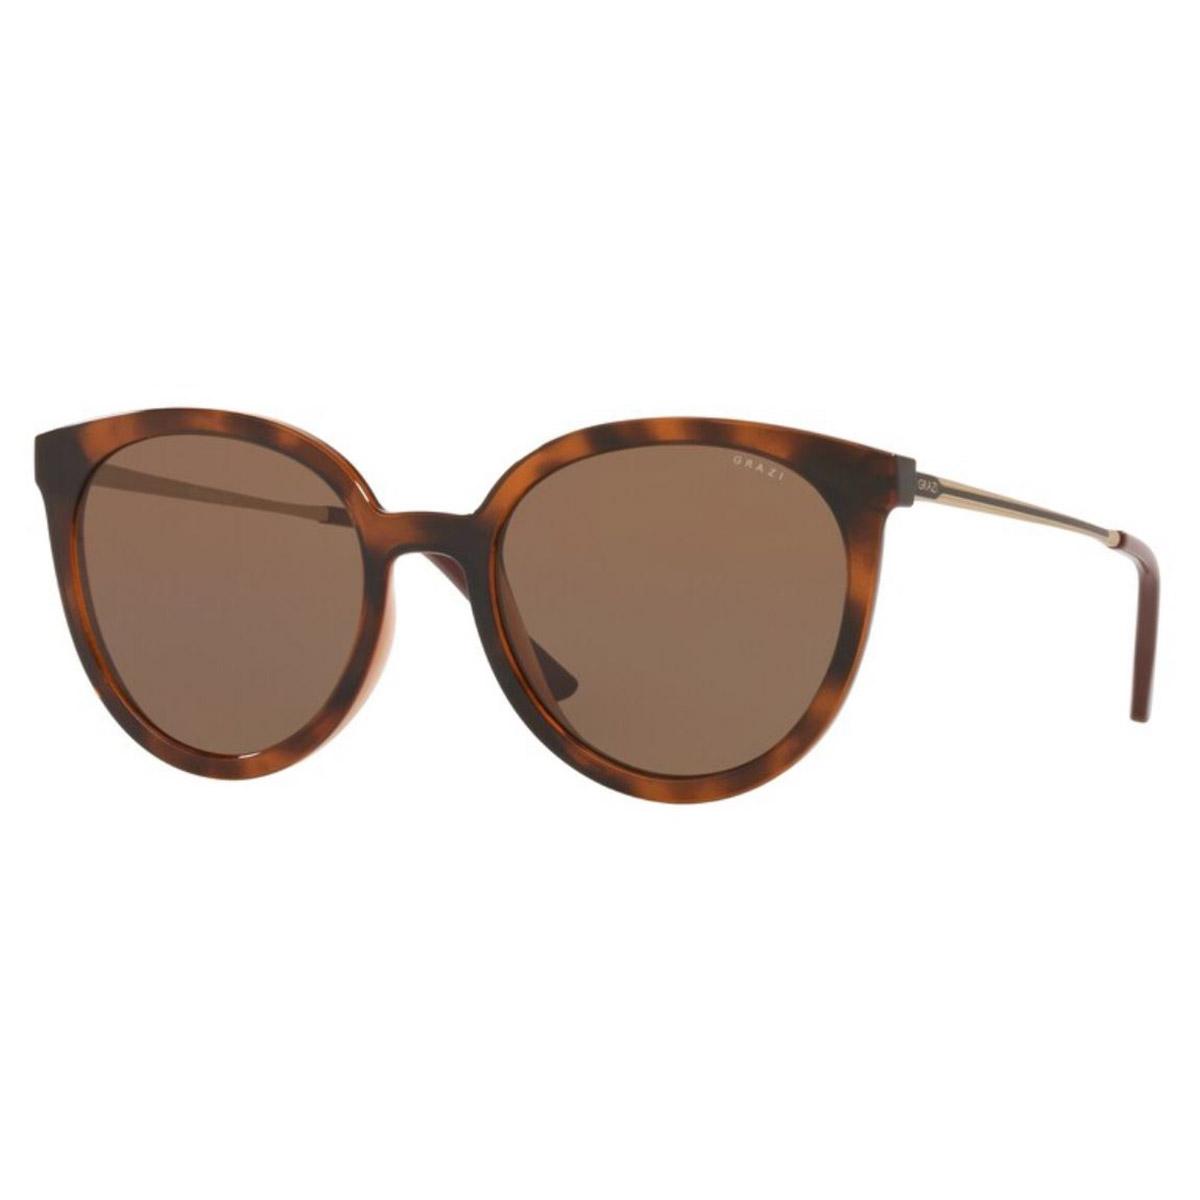 Óculos de Sol Grazi GZ4042 Preto com Marrom Havana Redondo